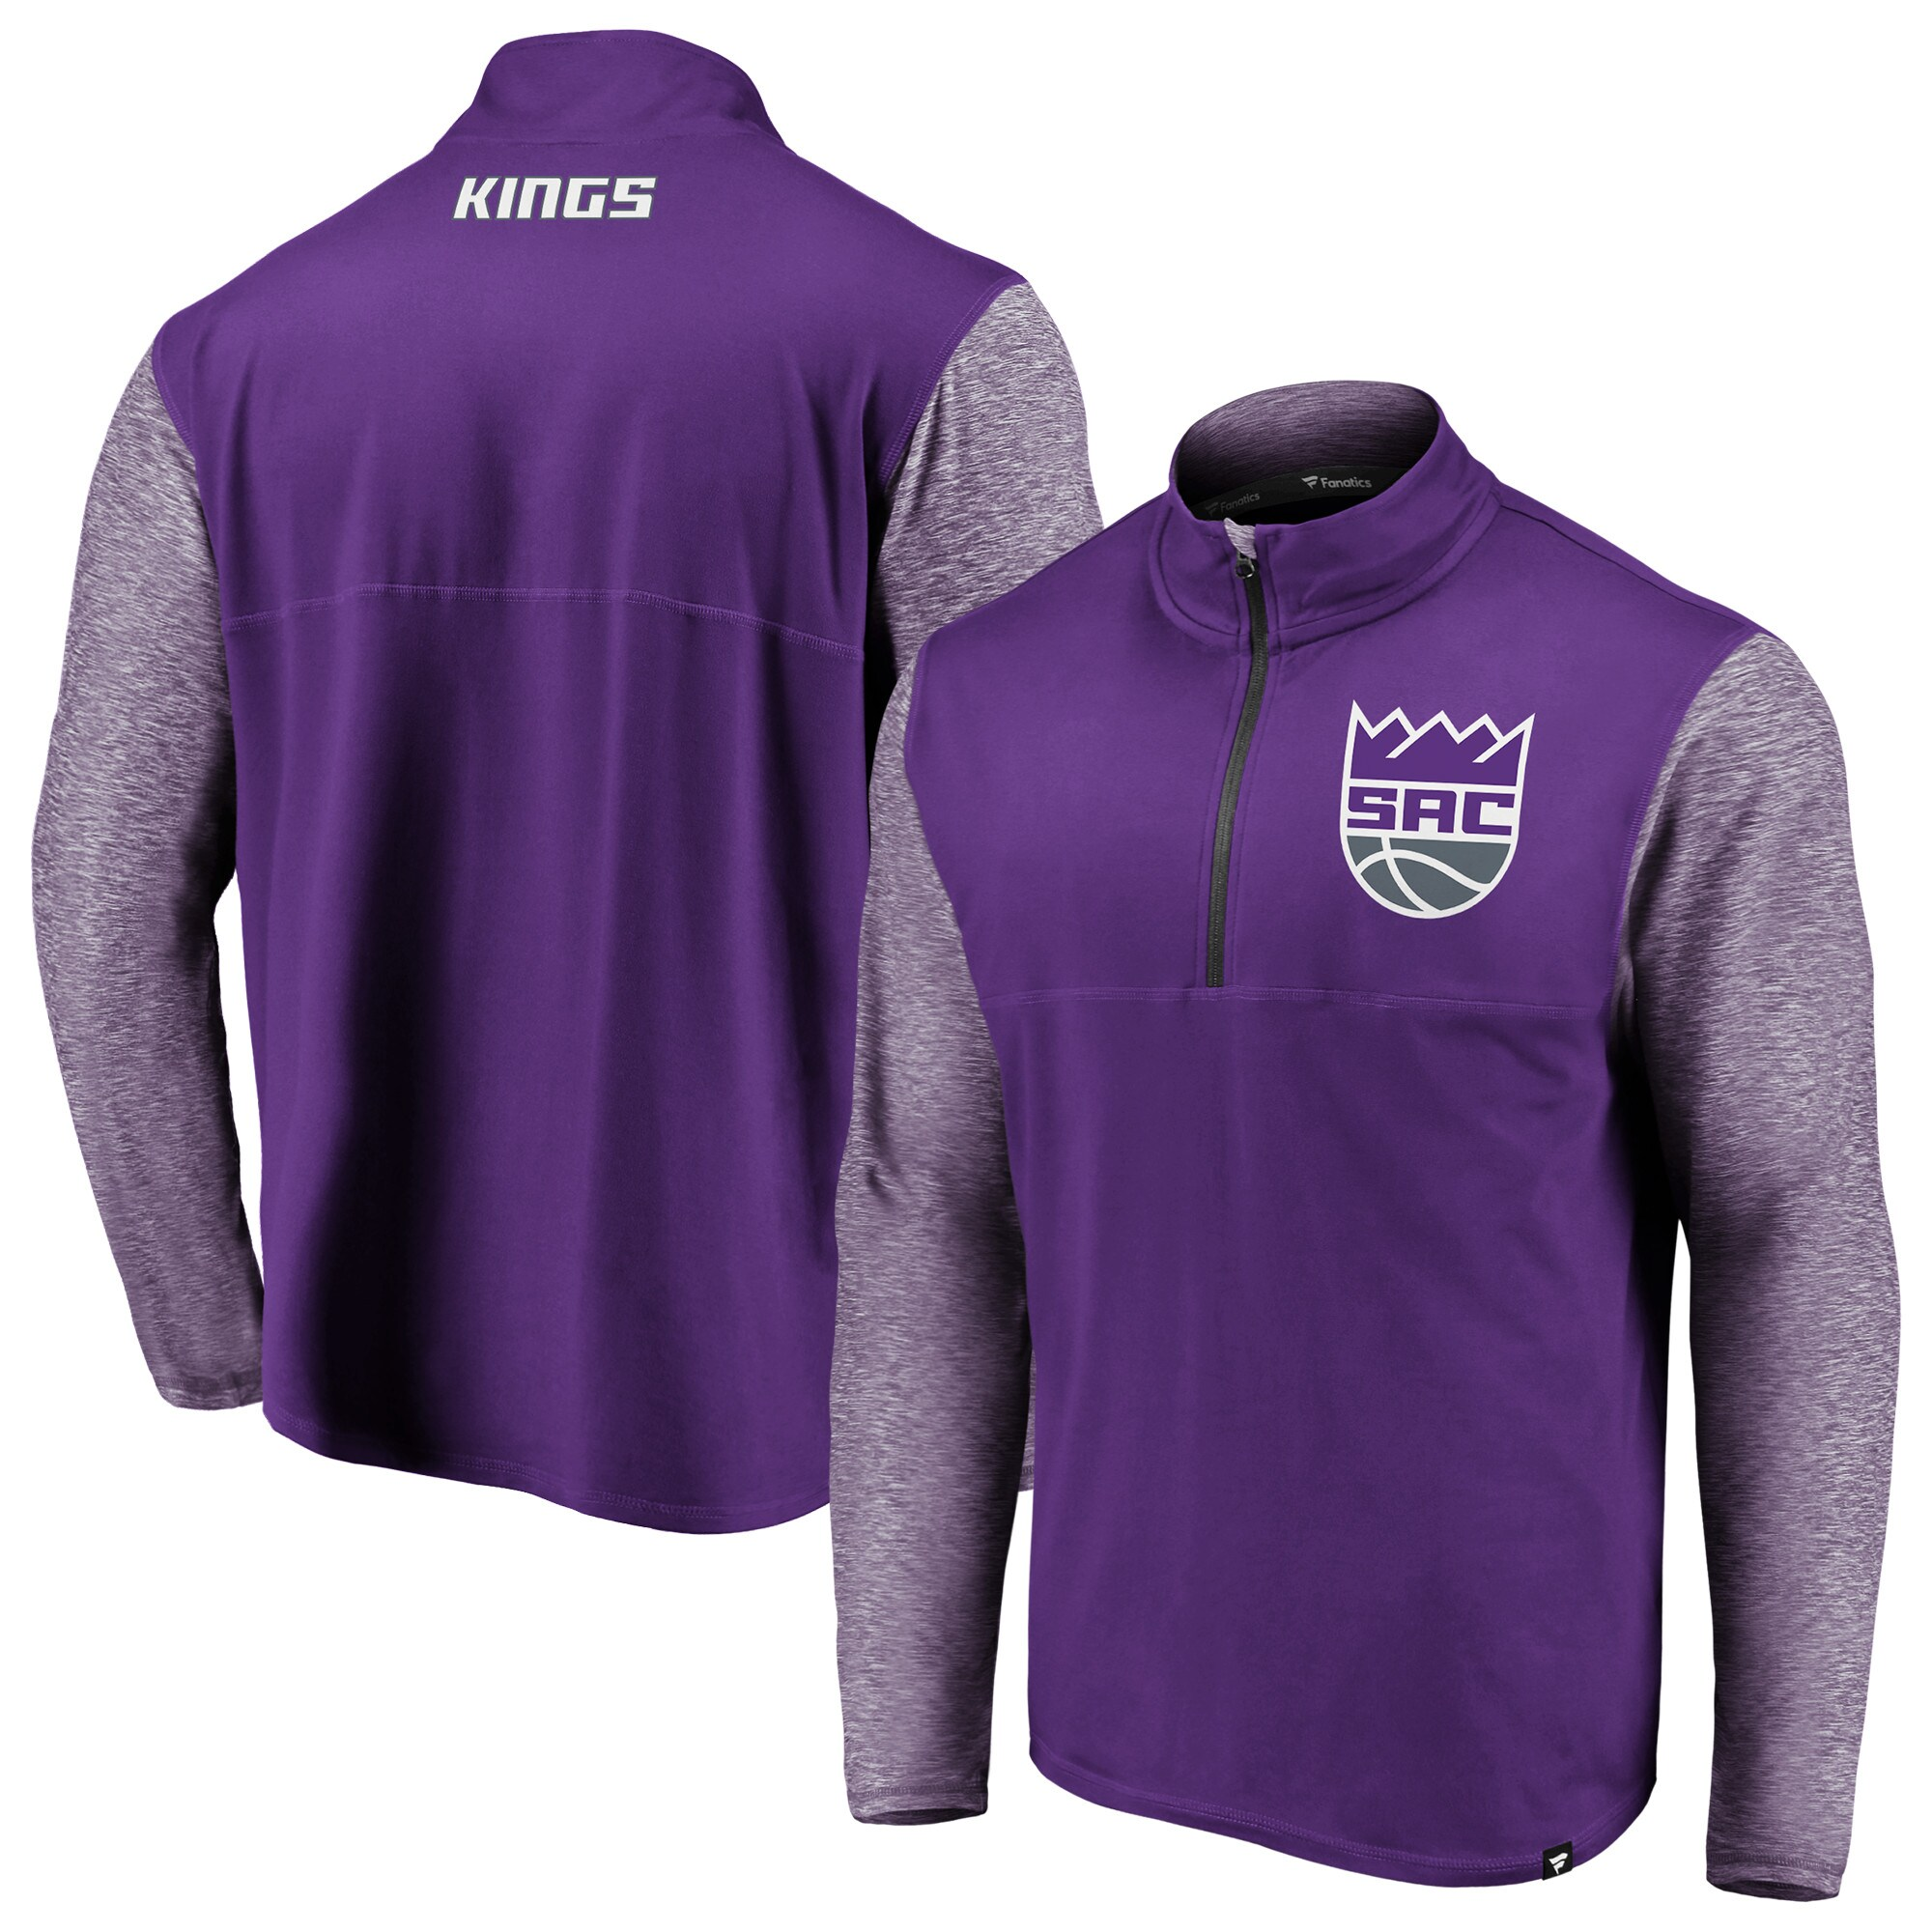 Sacramento Kings Fanatics Branded Made to Move Static Performance Quarter-Zip Pullover Jacket - Purple/Heathered Purple